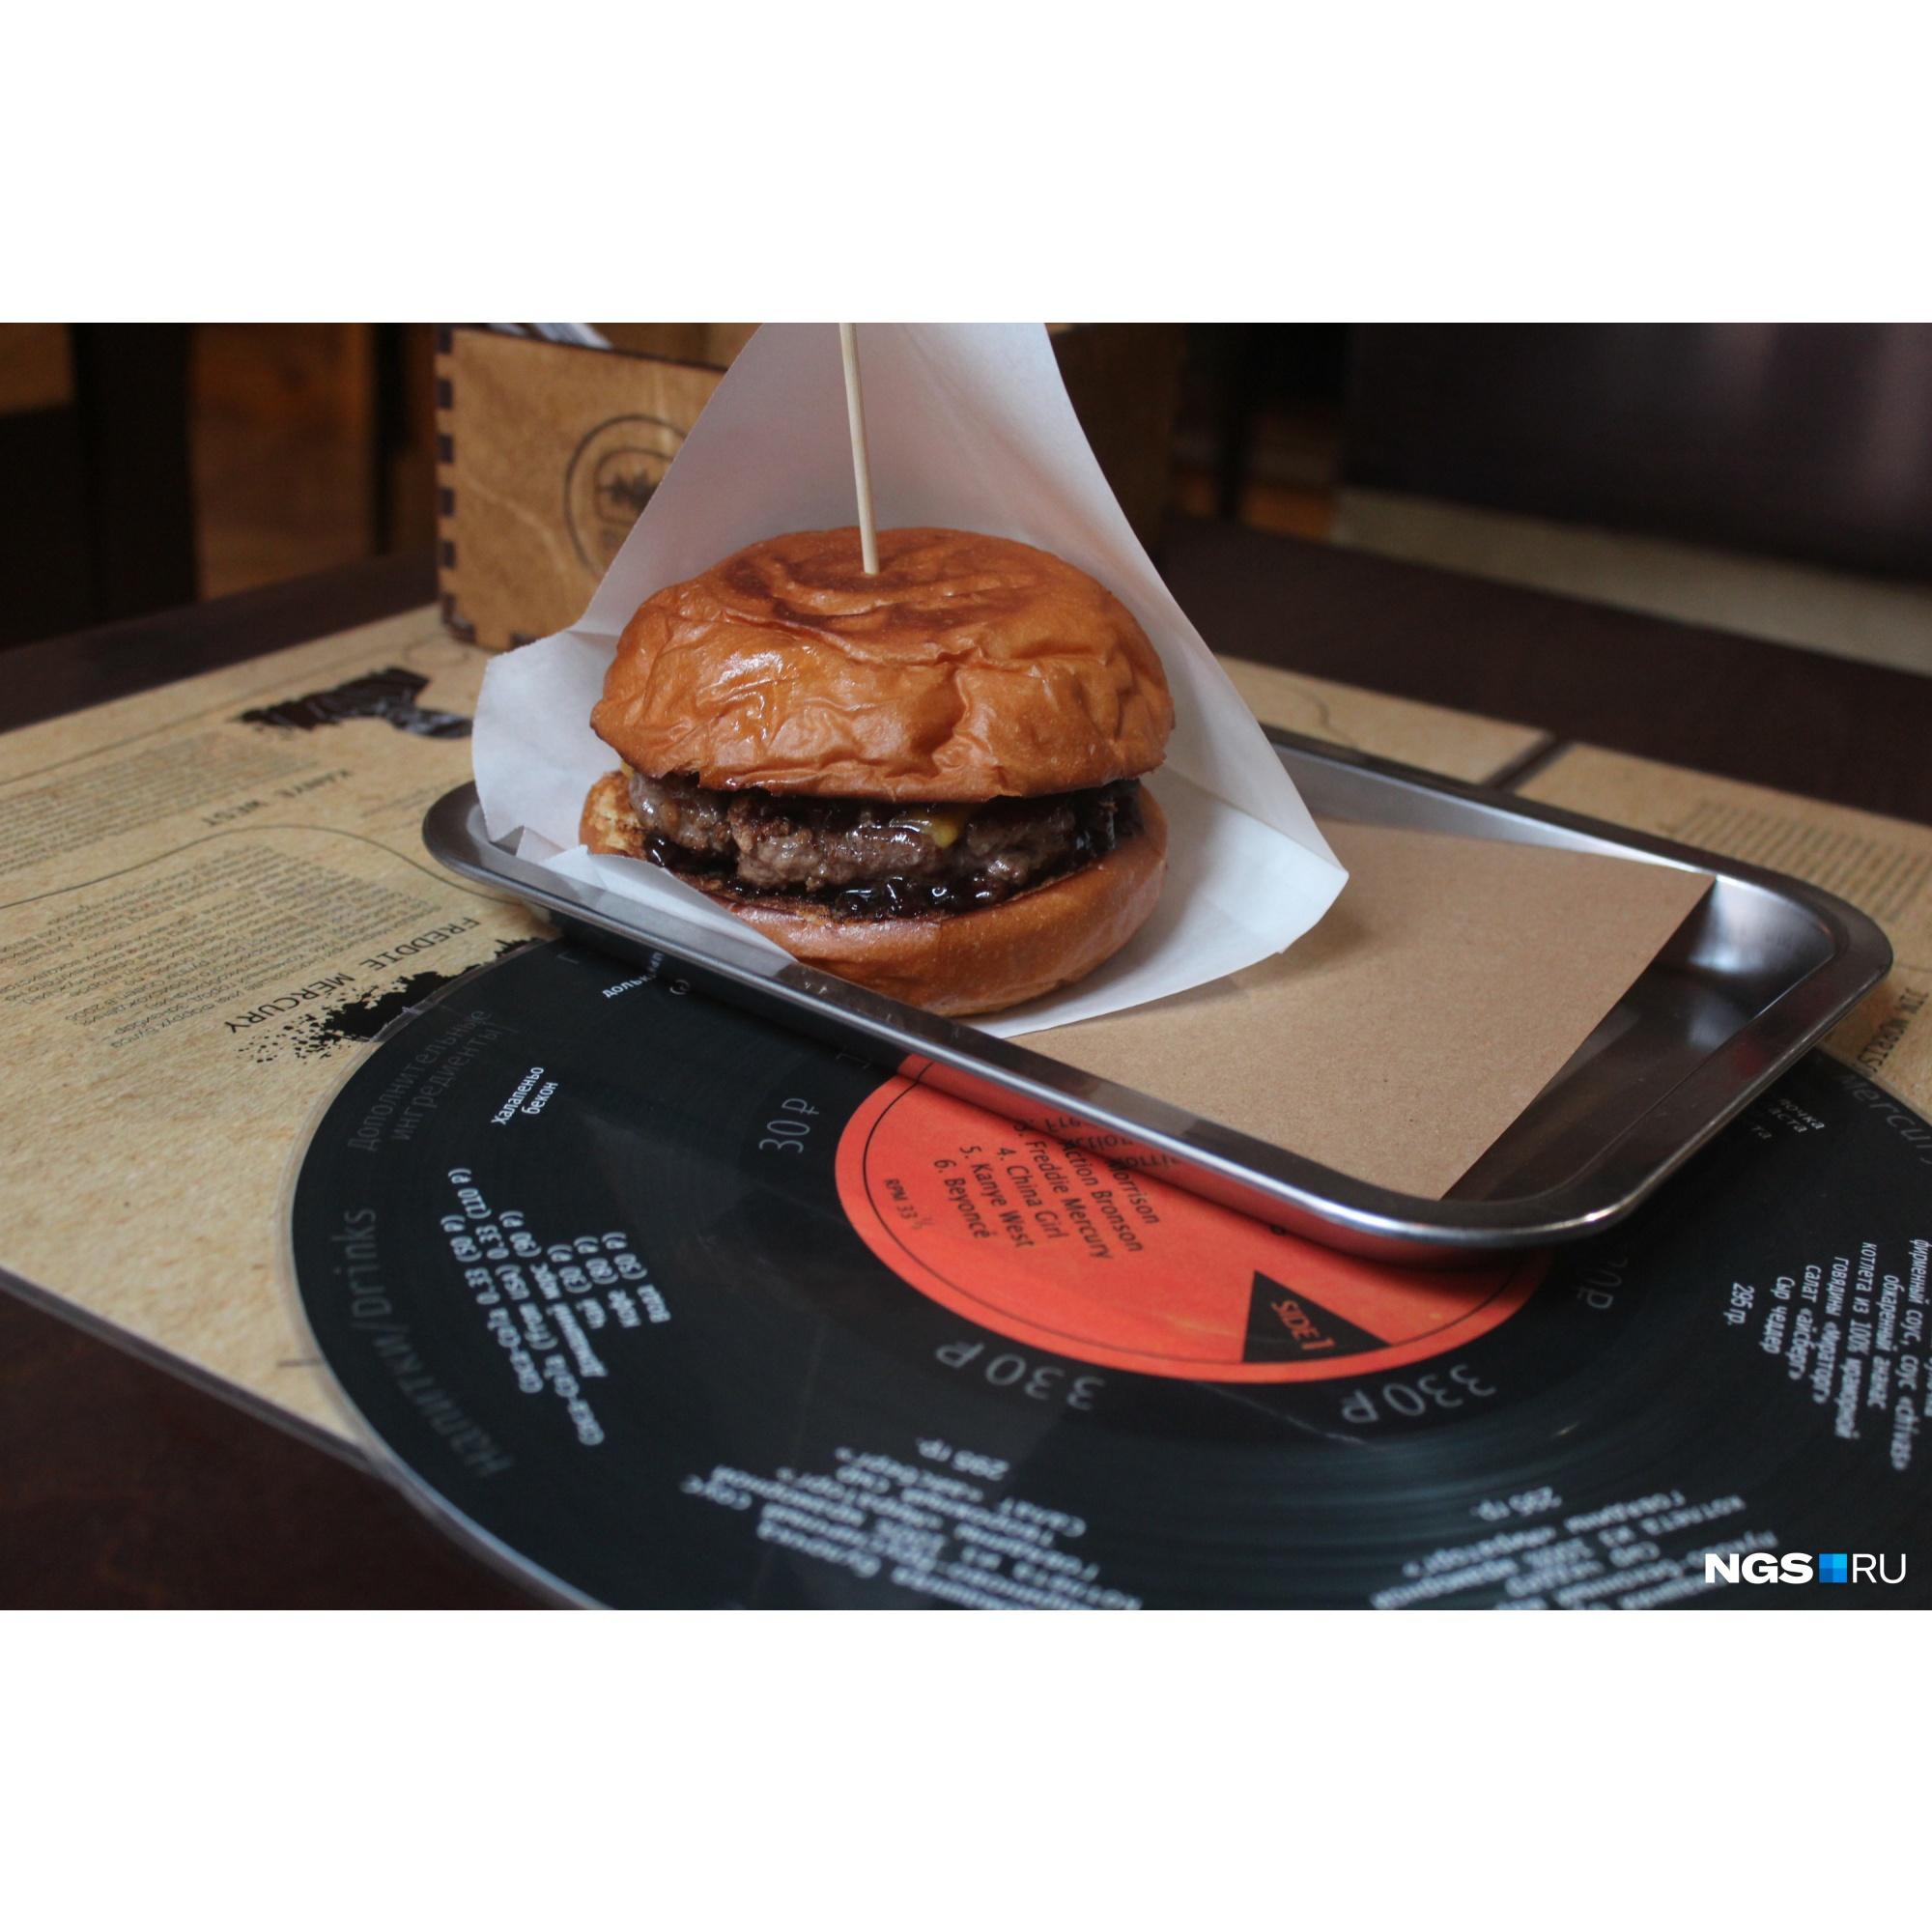 Бургер «Канье Уэст» за 330 рублей